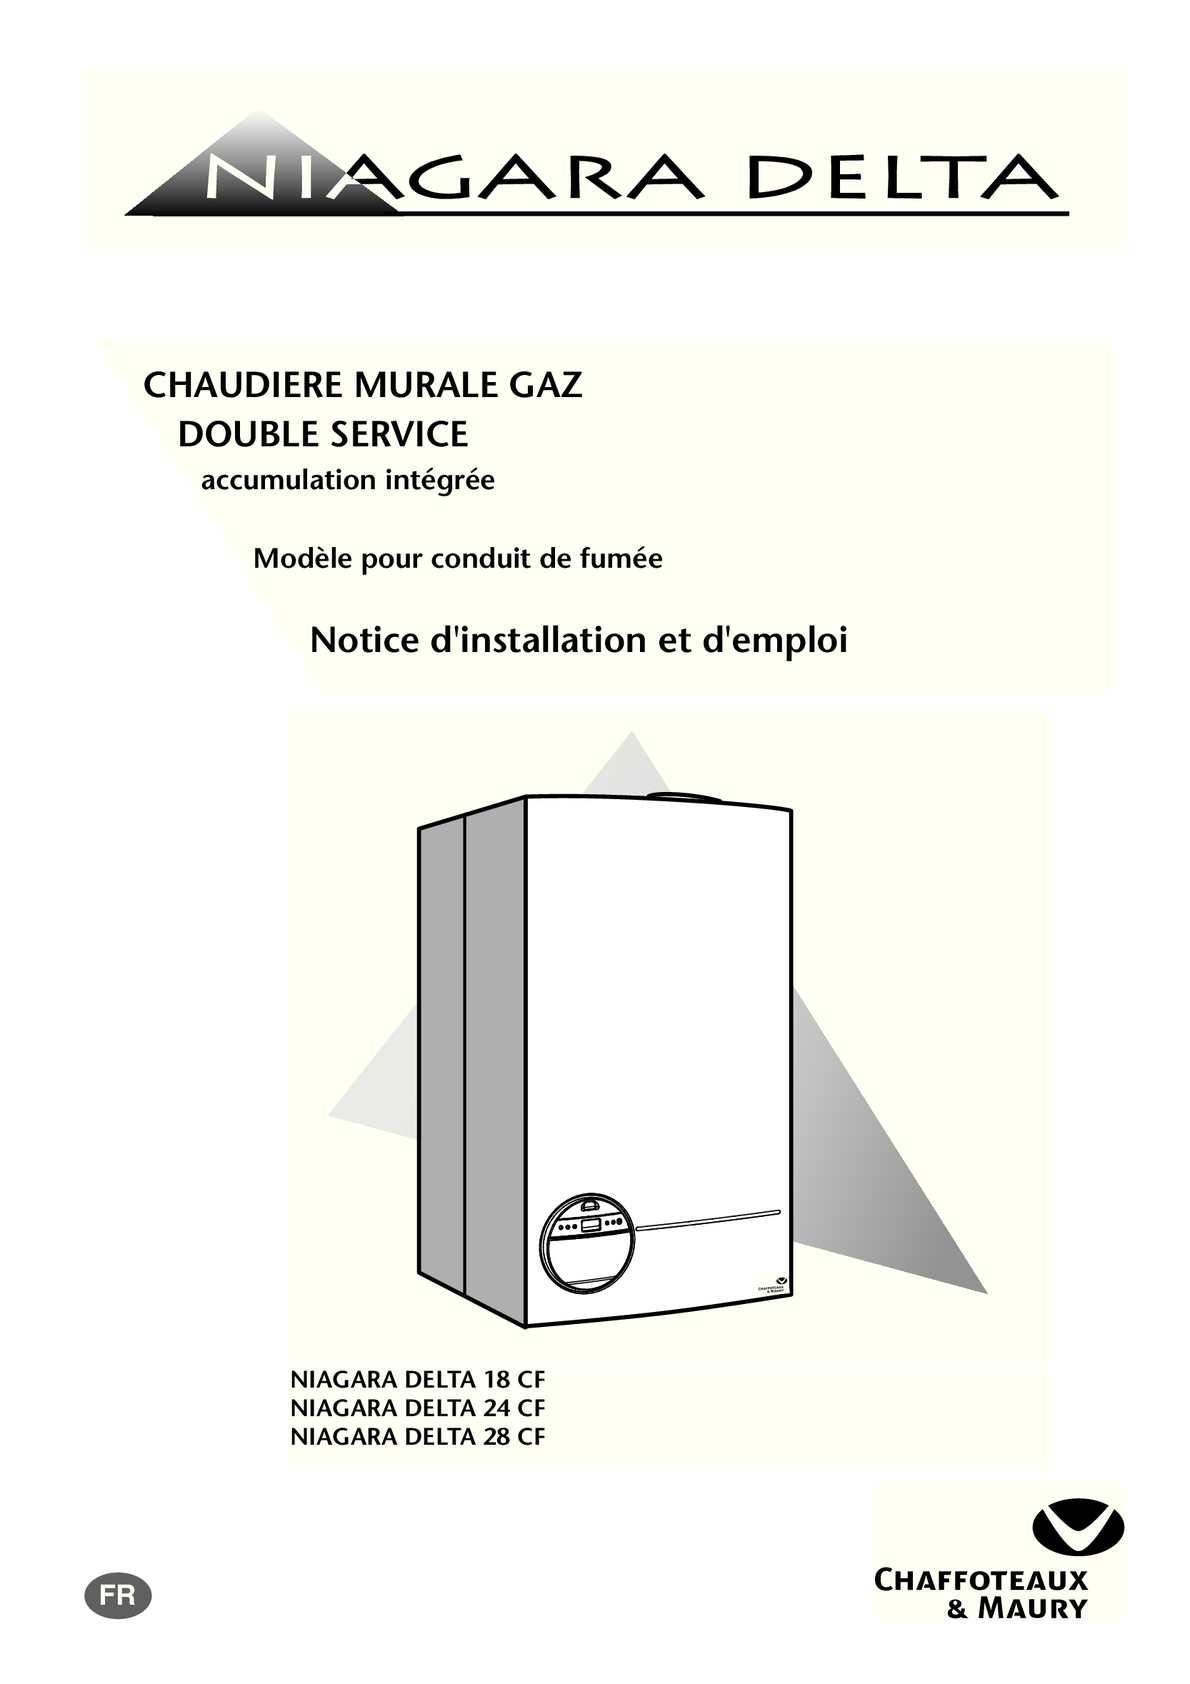 Calam o pdf notice chaudi re niagara delta - Vidanger circuit chauffage ...